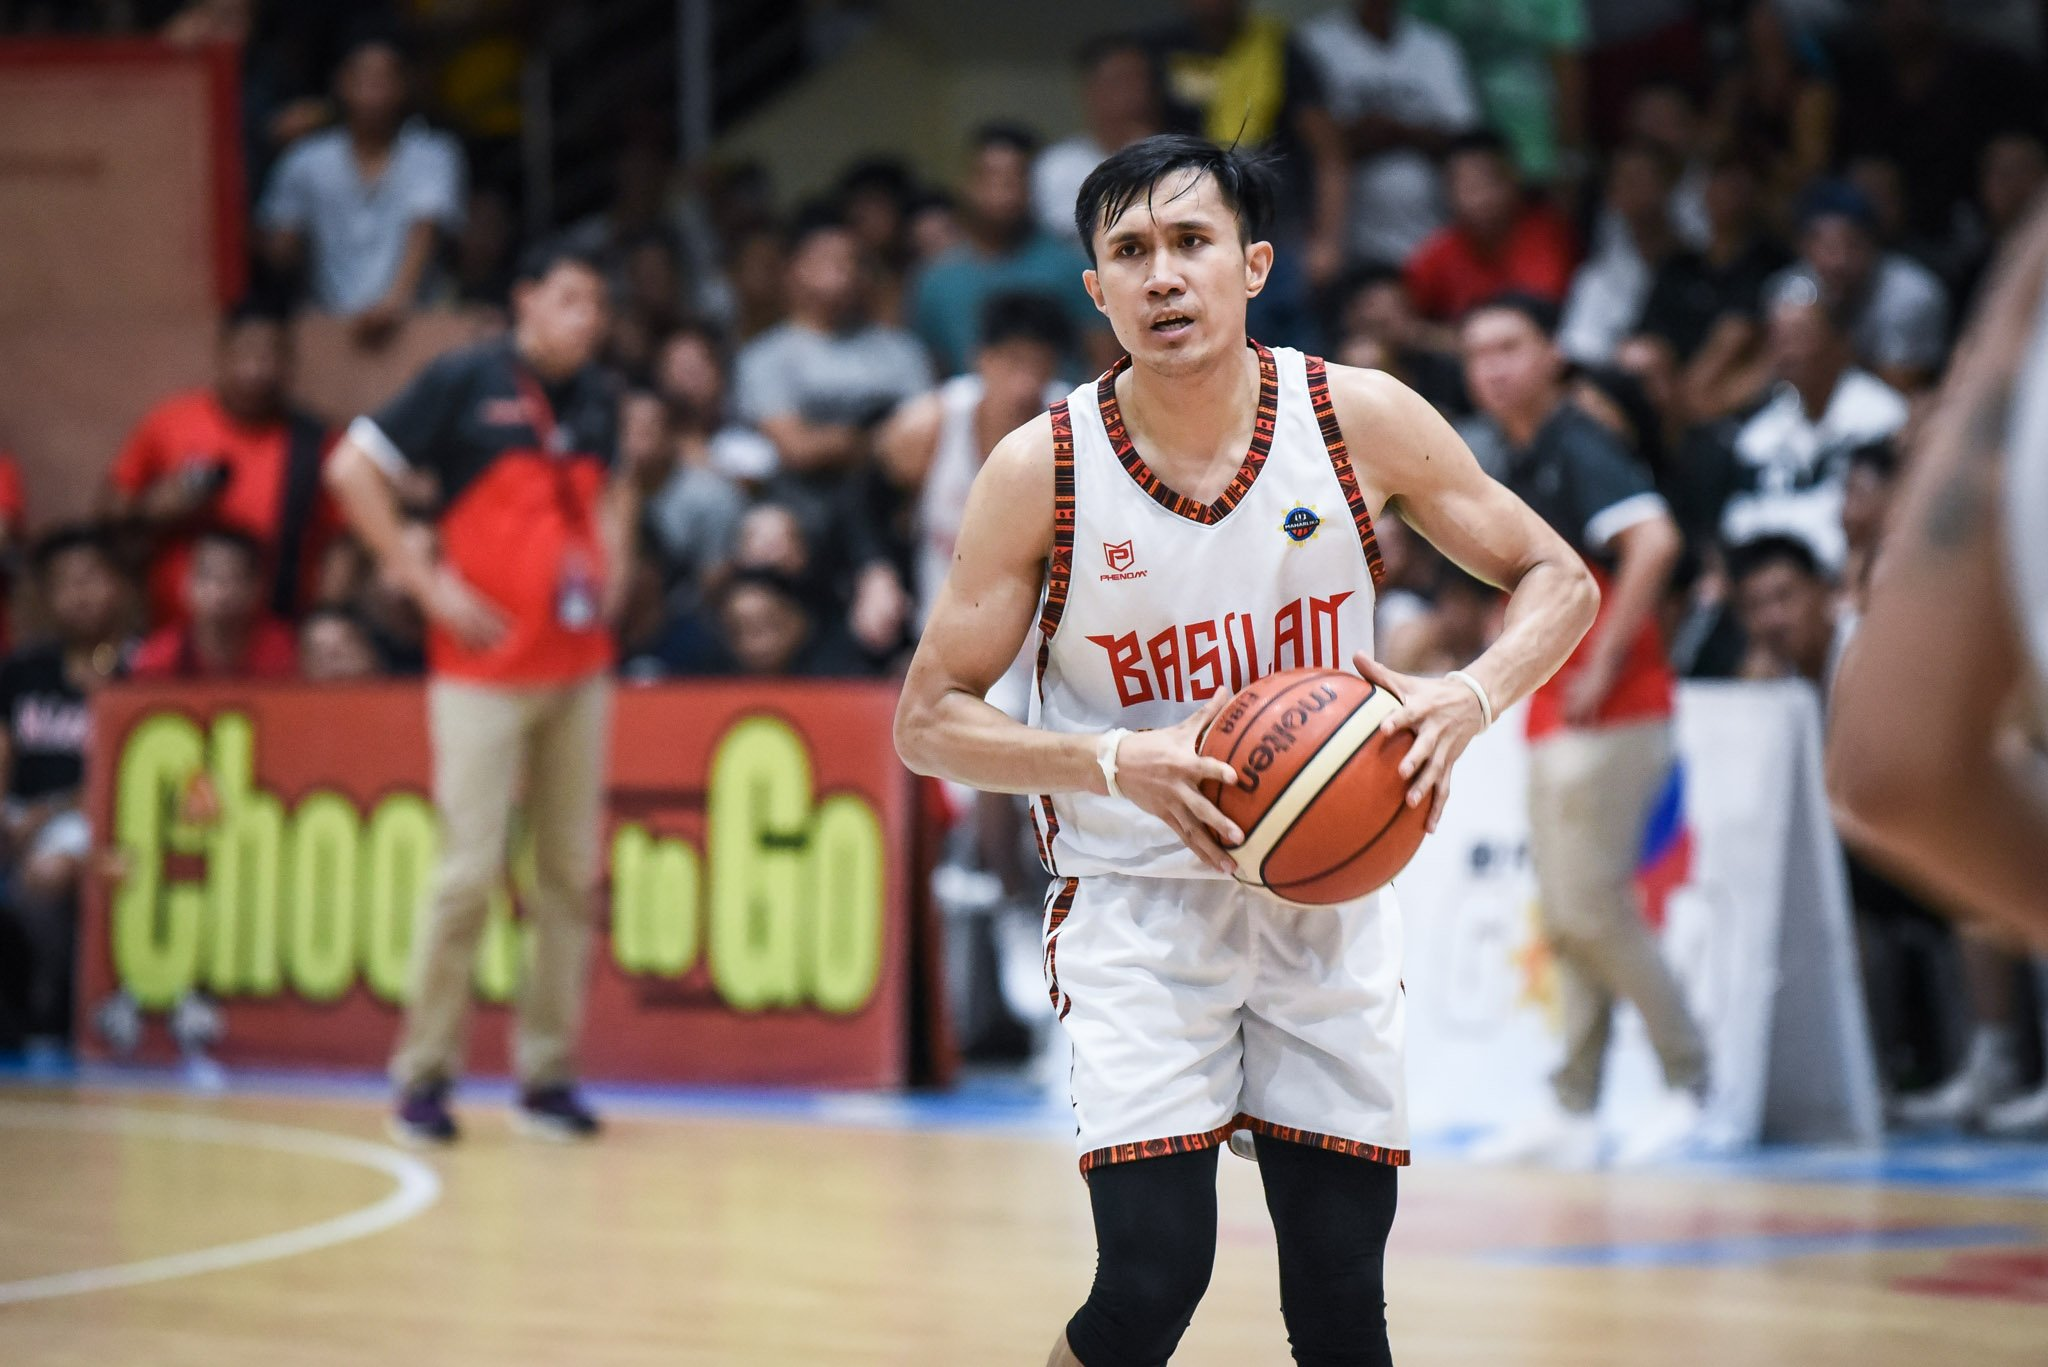 Tiebreaker Times Hesed Gabo hard on self after Basilan's Game Two loss Basketball MPBL News  Leo Gabo Basilan Steel 2019-20 MPBL Lakan Cup